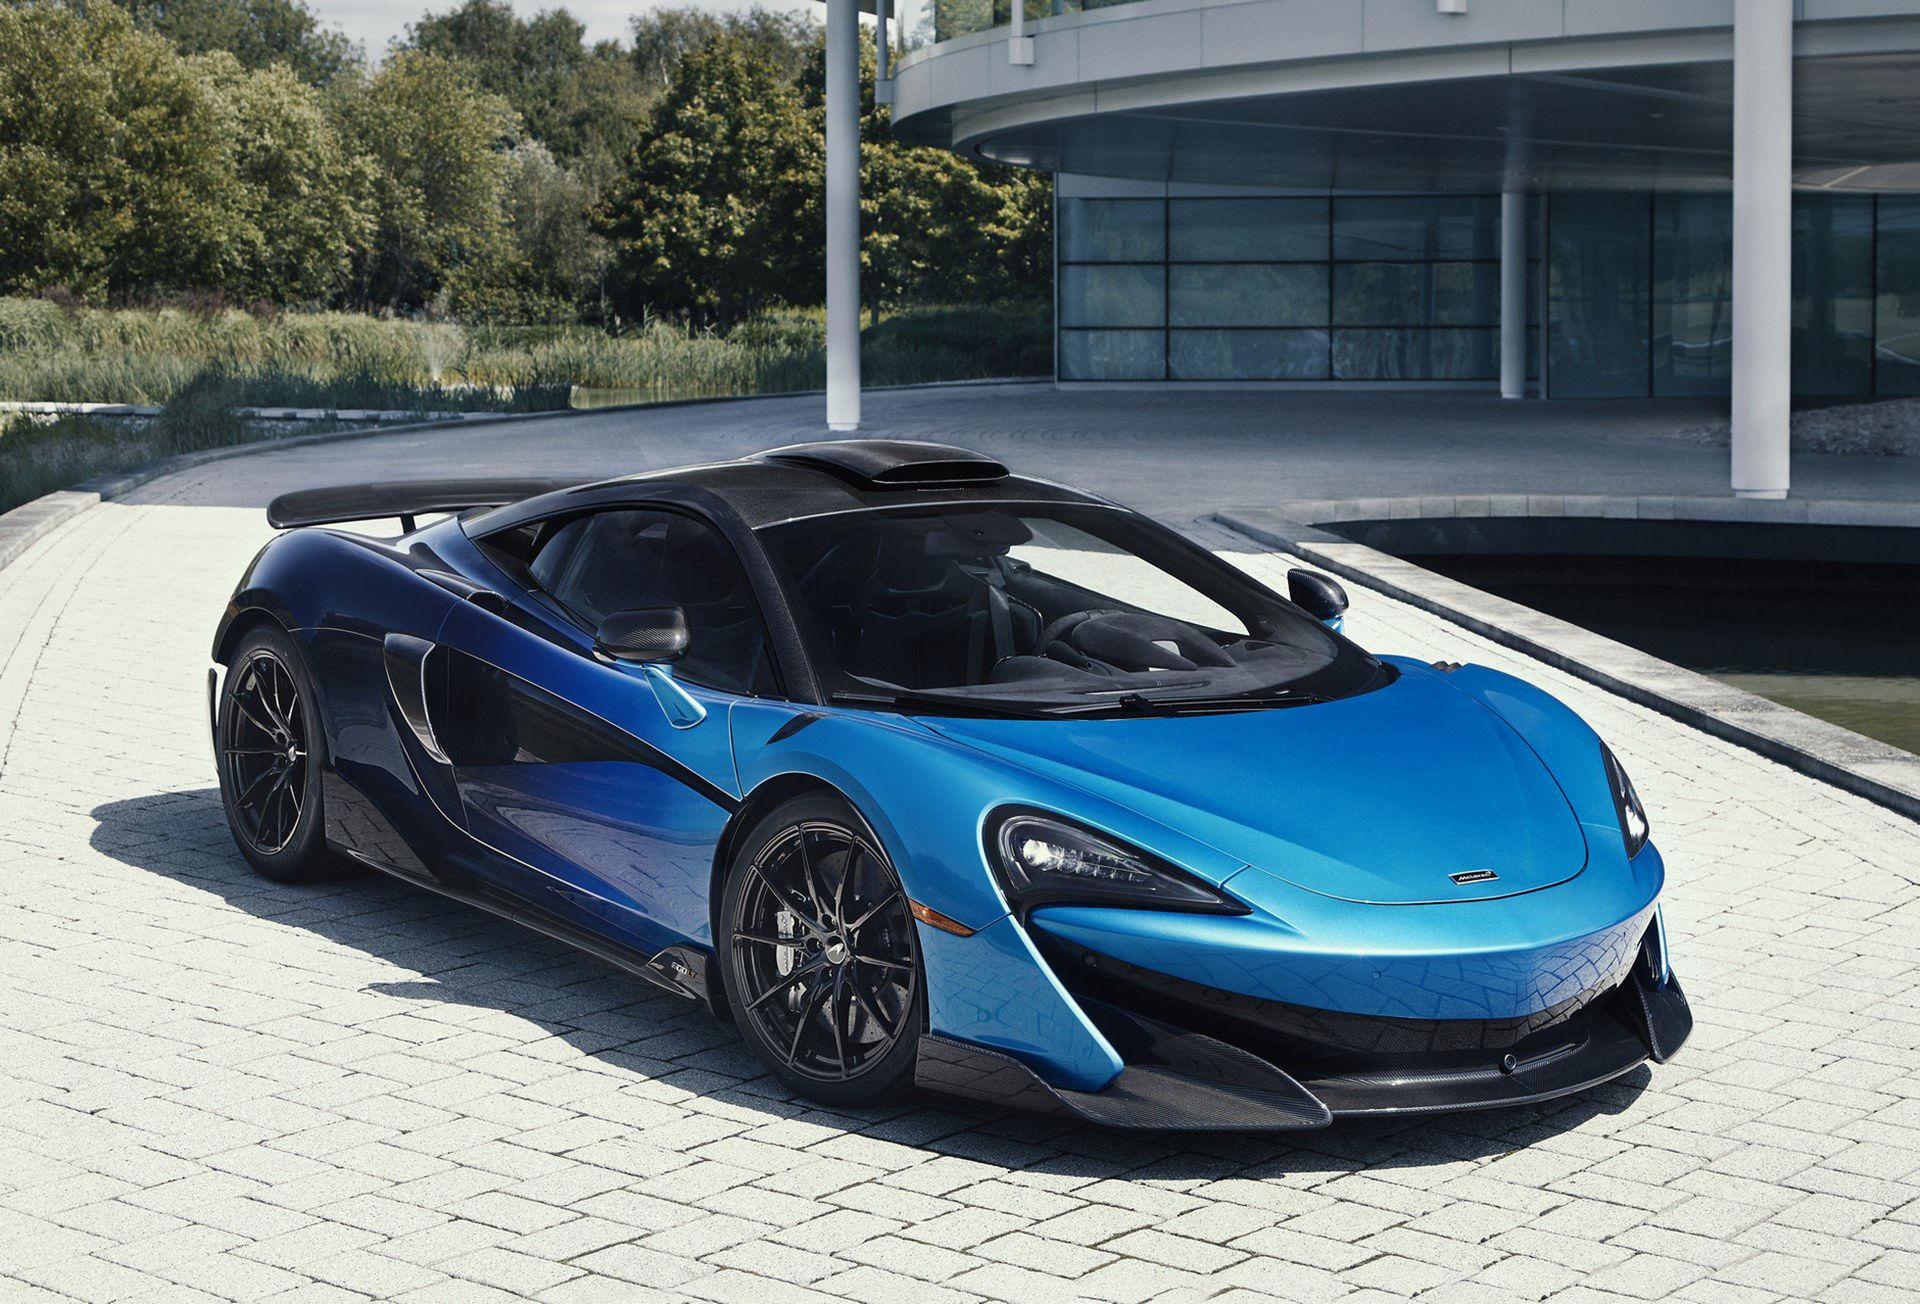 Ny specialare från McLaren